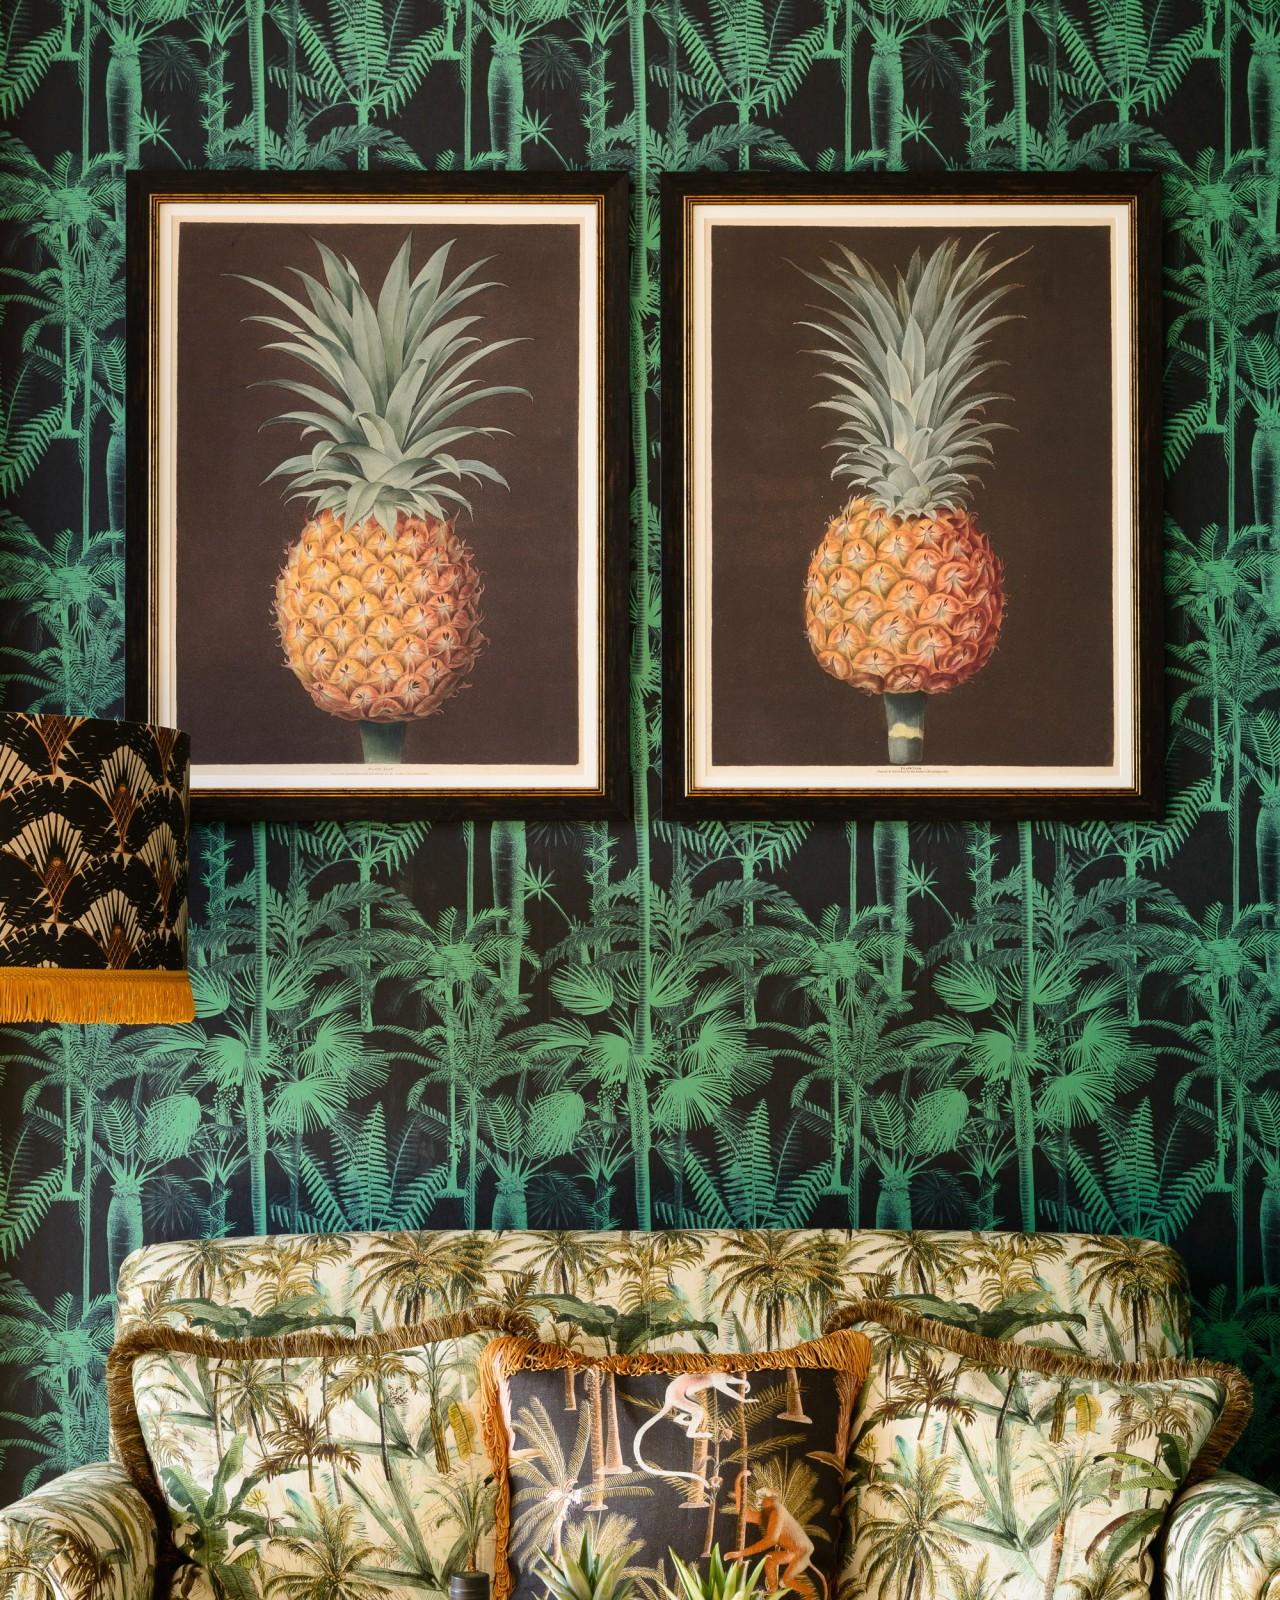 PINEAPPLES OF ANTIGUA - THE HAVANNAH PINE BY BROOKSHAW Framed Art